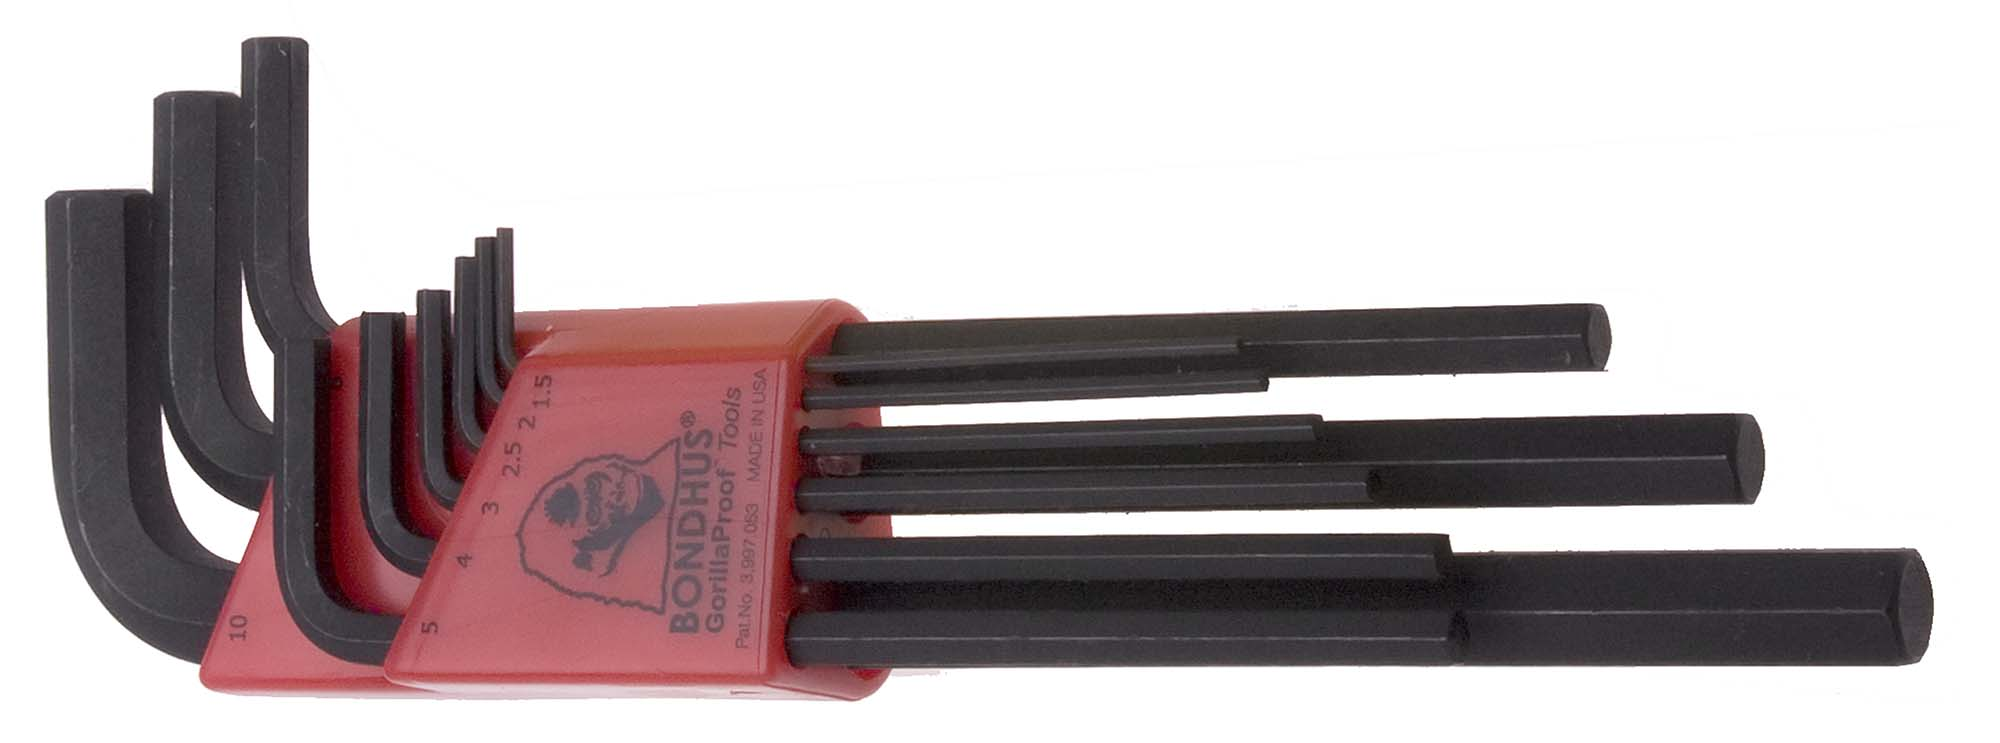 Bondhus 12199 Metric L-Wrenche Hex Key Set 1.5 - 10mm Set of 9